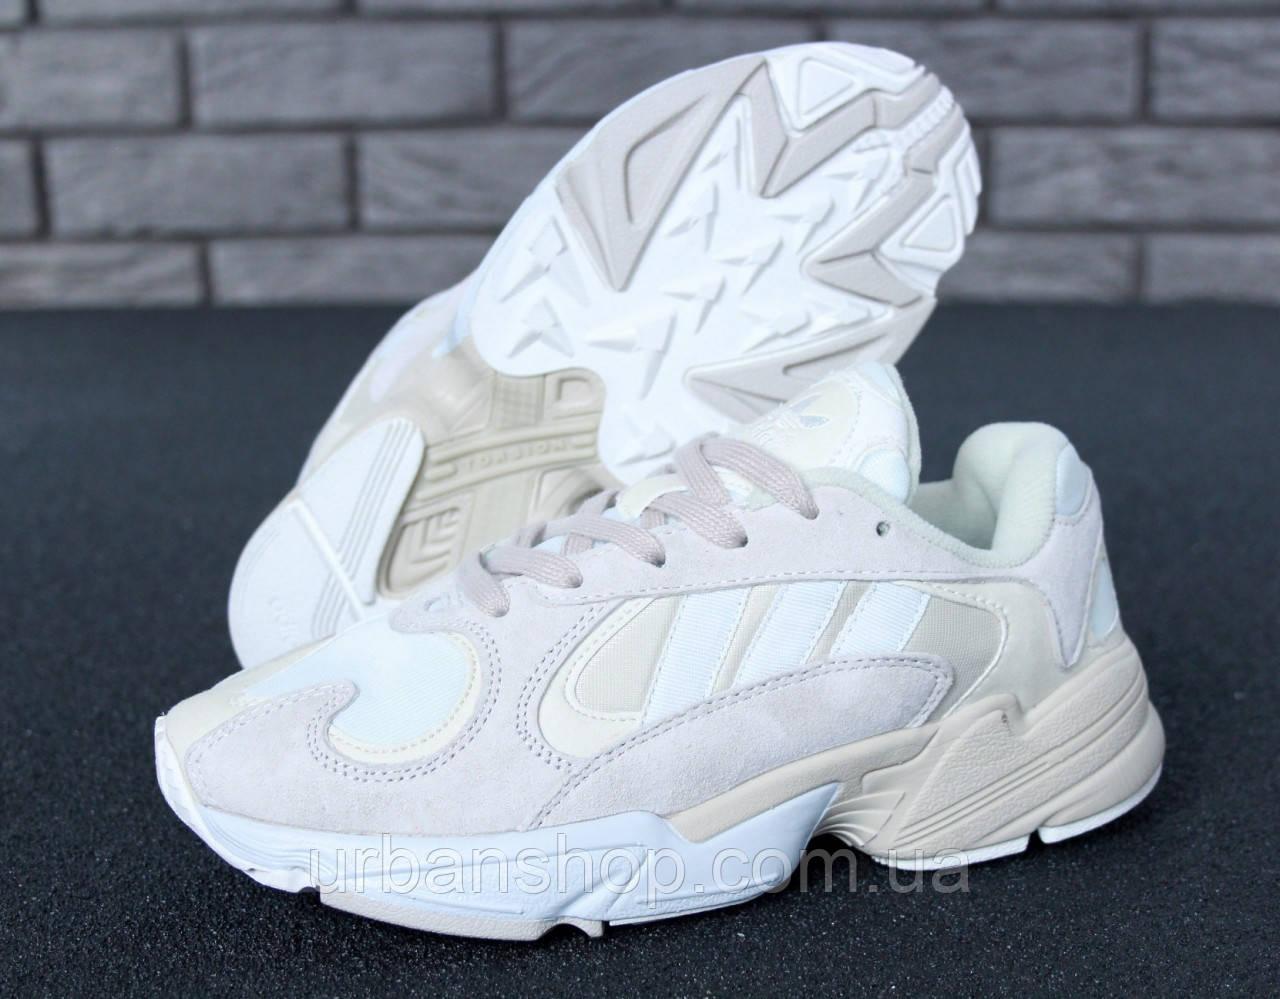 Жіночі кросівки AD YUNG-1 White. ТОП Репліка ААА класу.